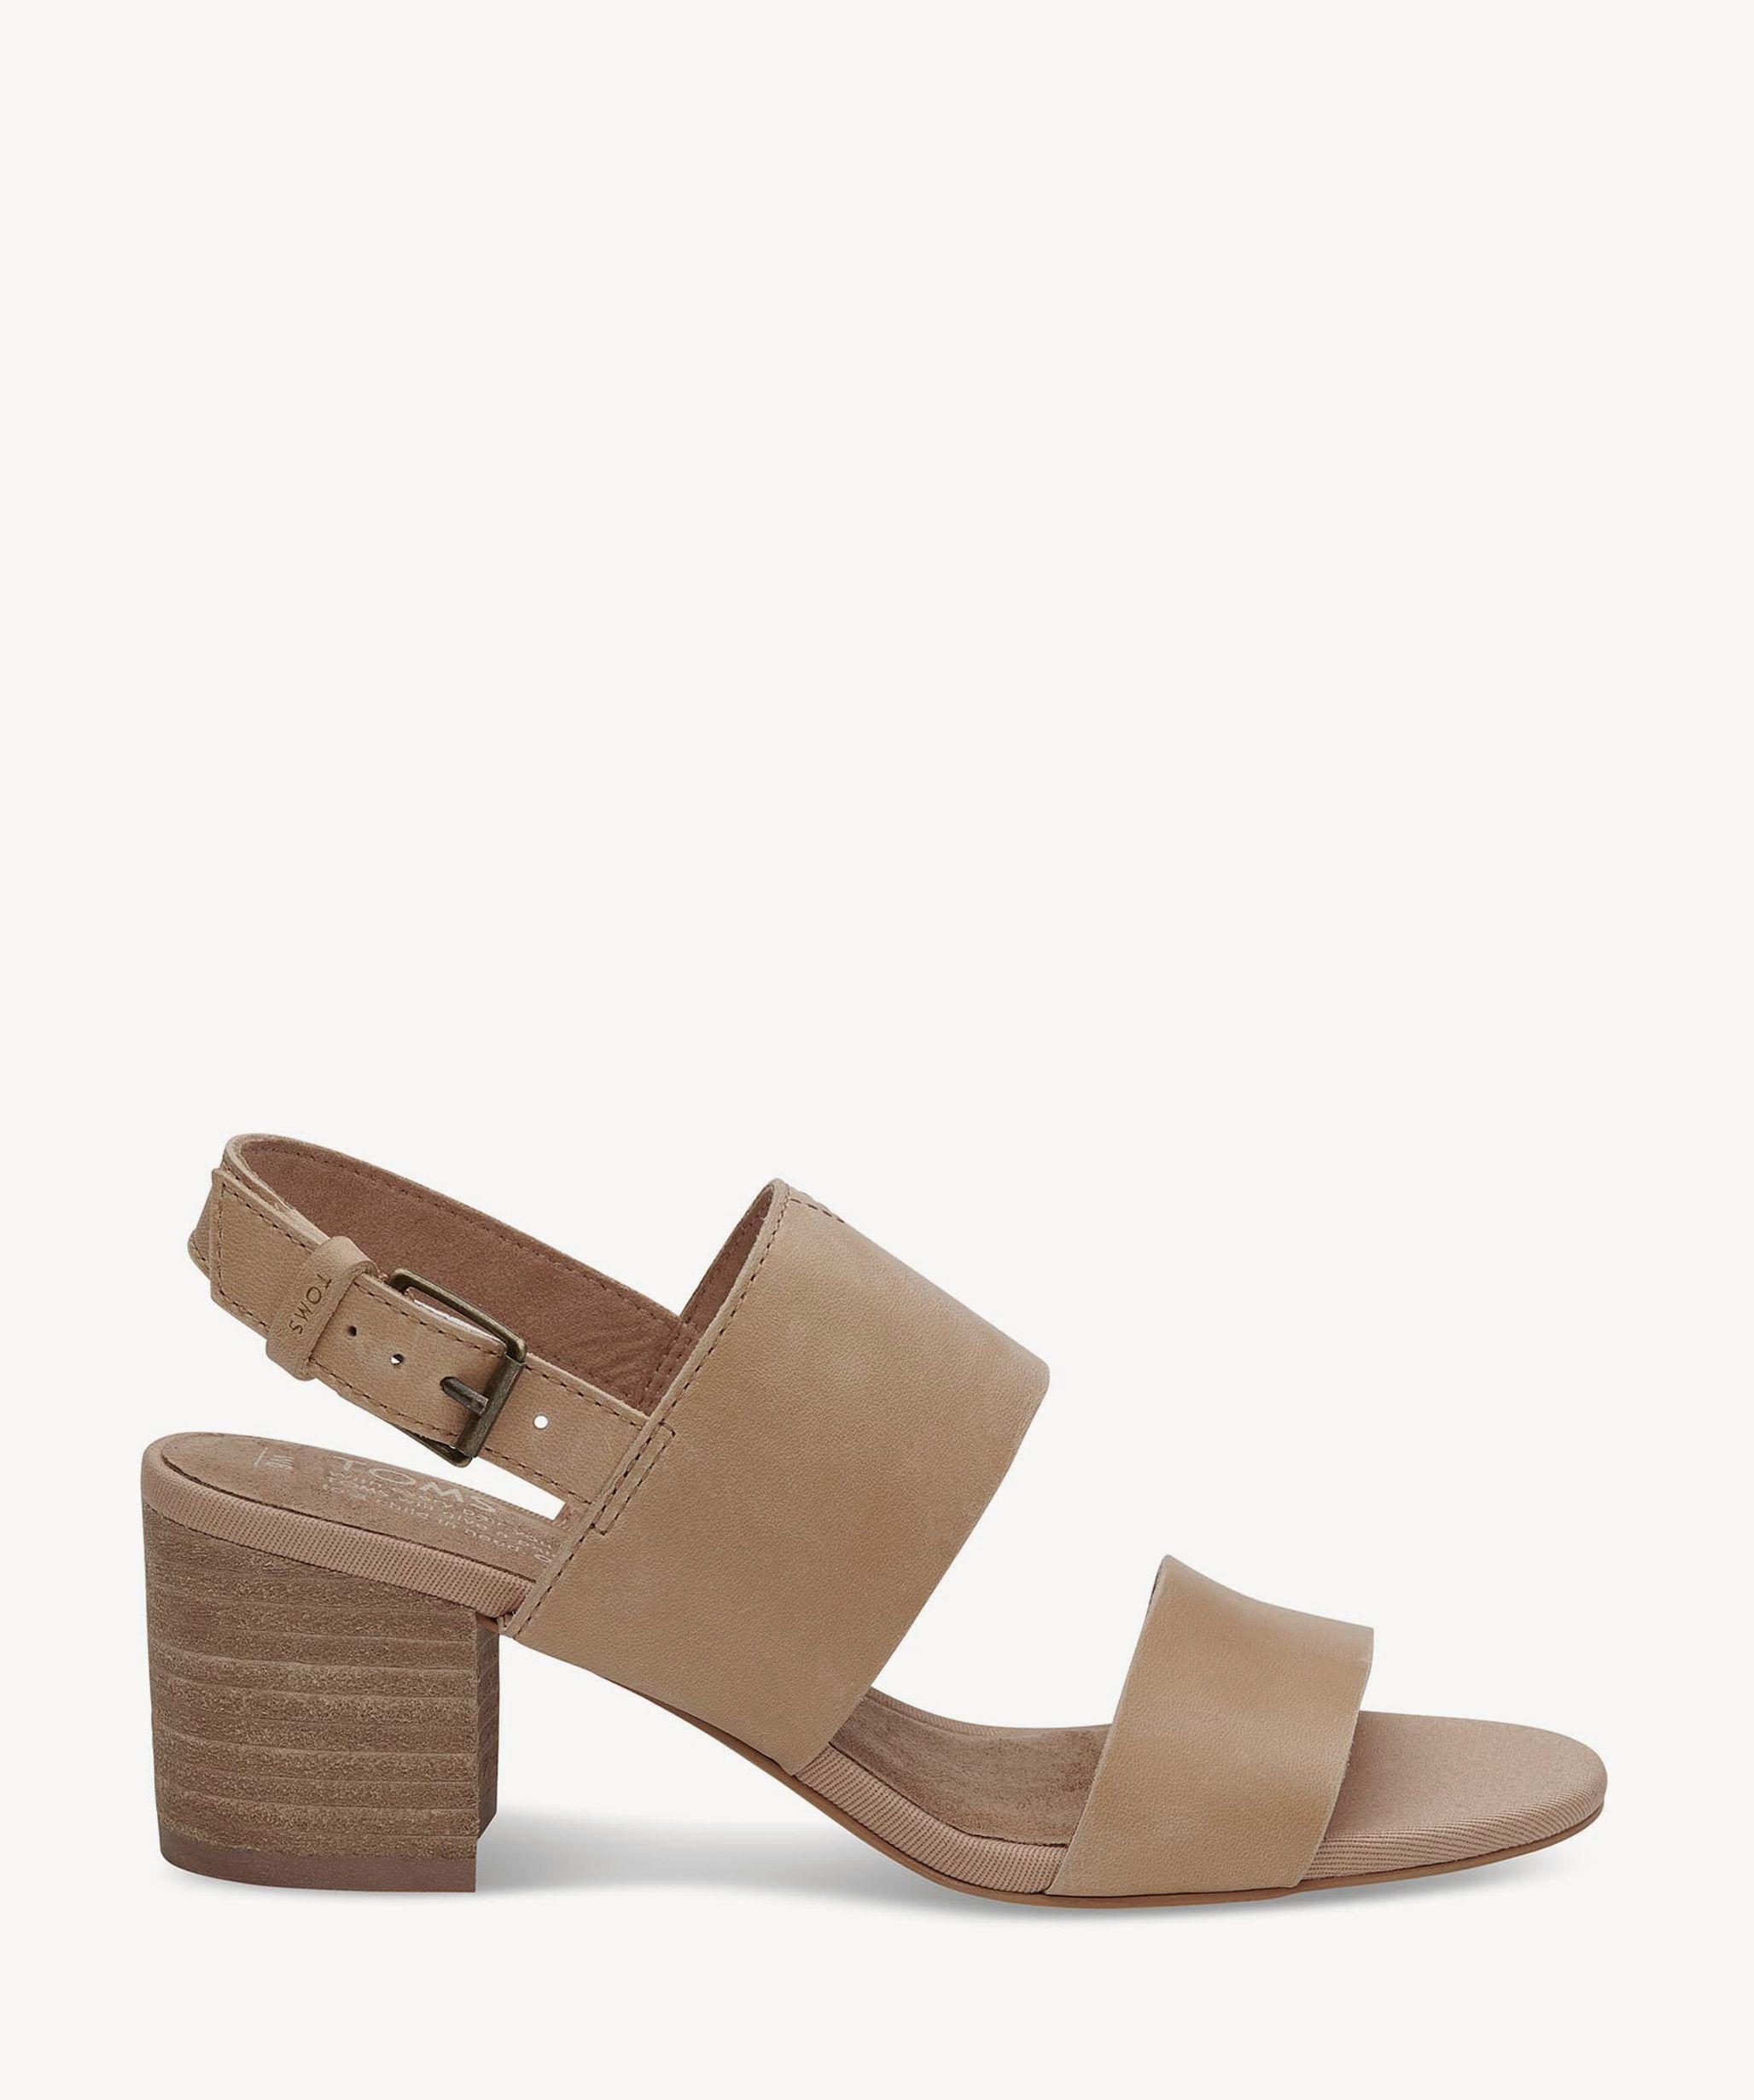 71e04eed0f0 Toms Poppy Block Heels Sandals Honey Leather